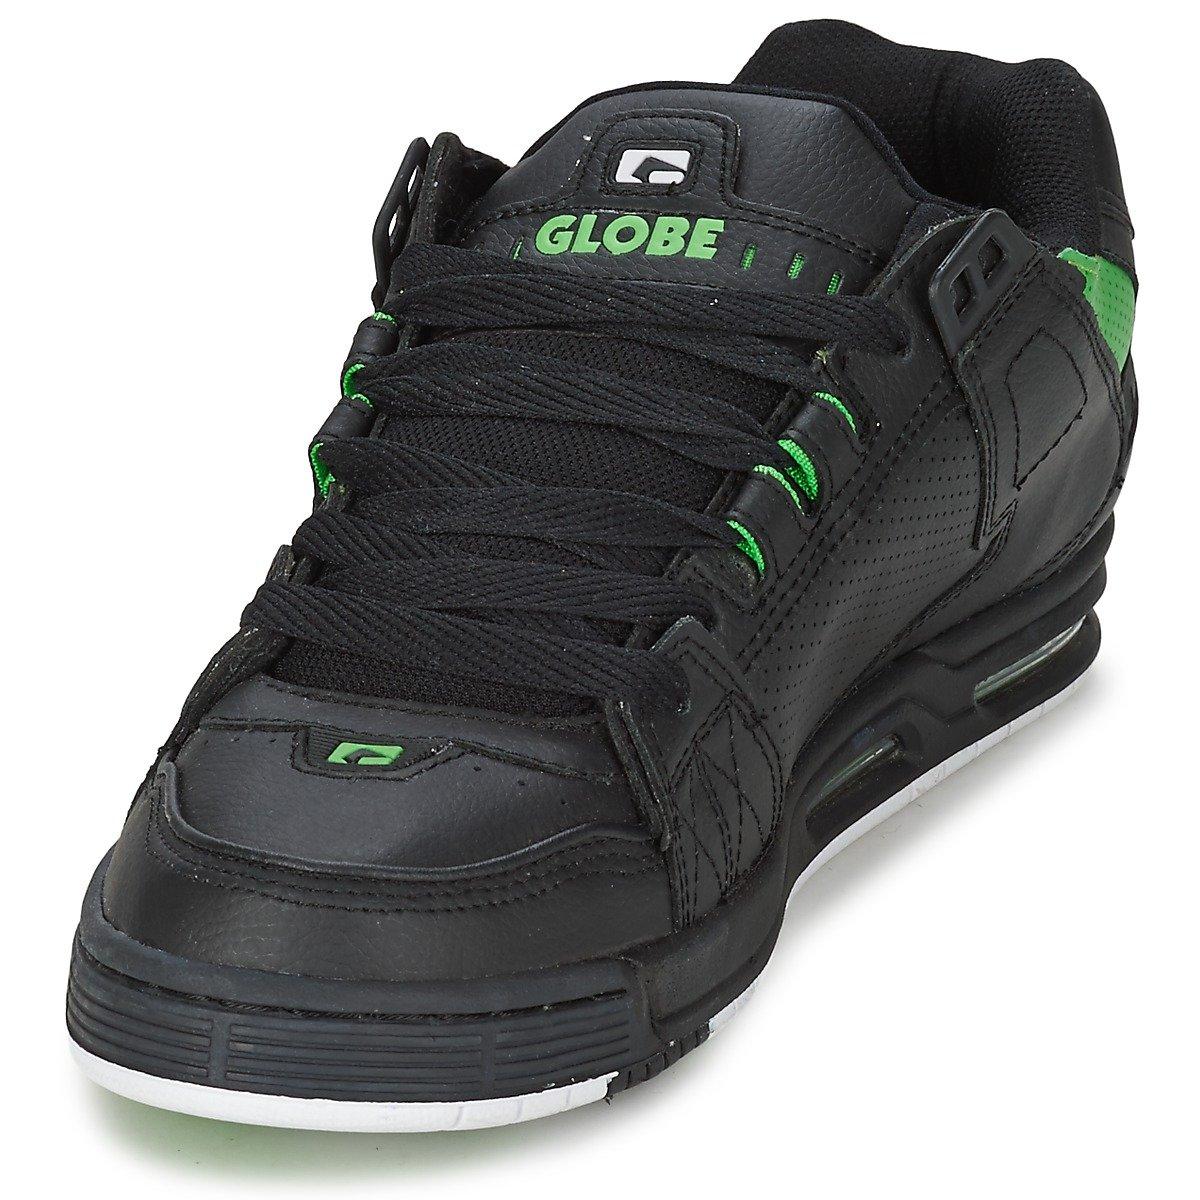 813cd6dc57 Globe Sabre Baskets Mode Hommes Noir/Vert - 45 - Baskets Basses: Amazon.fr:  Chaussures et Sacs